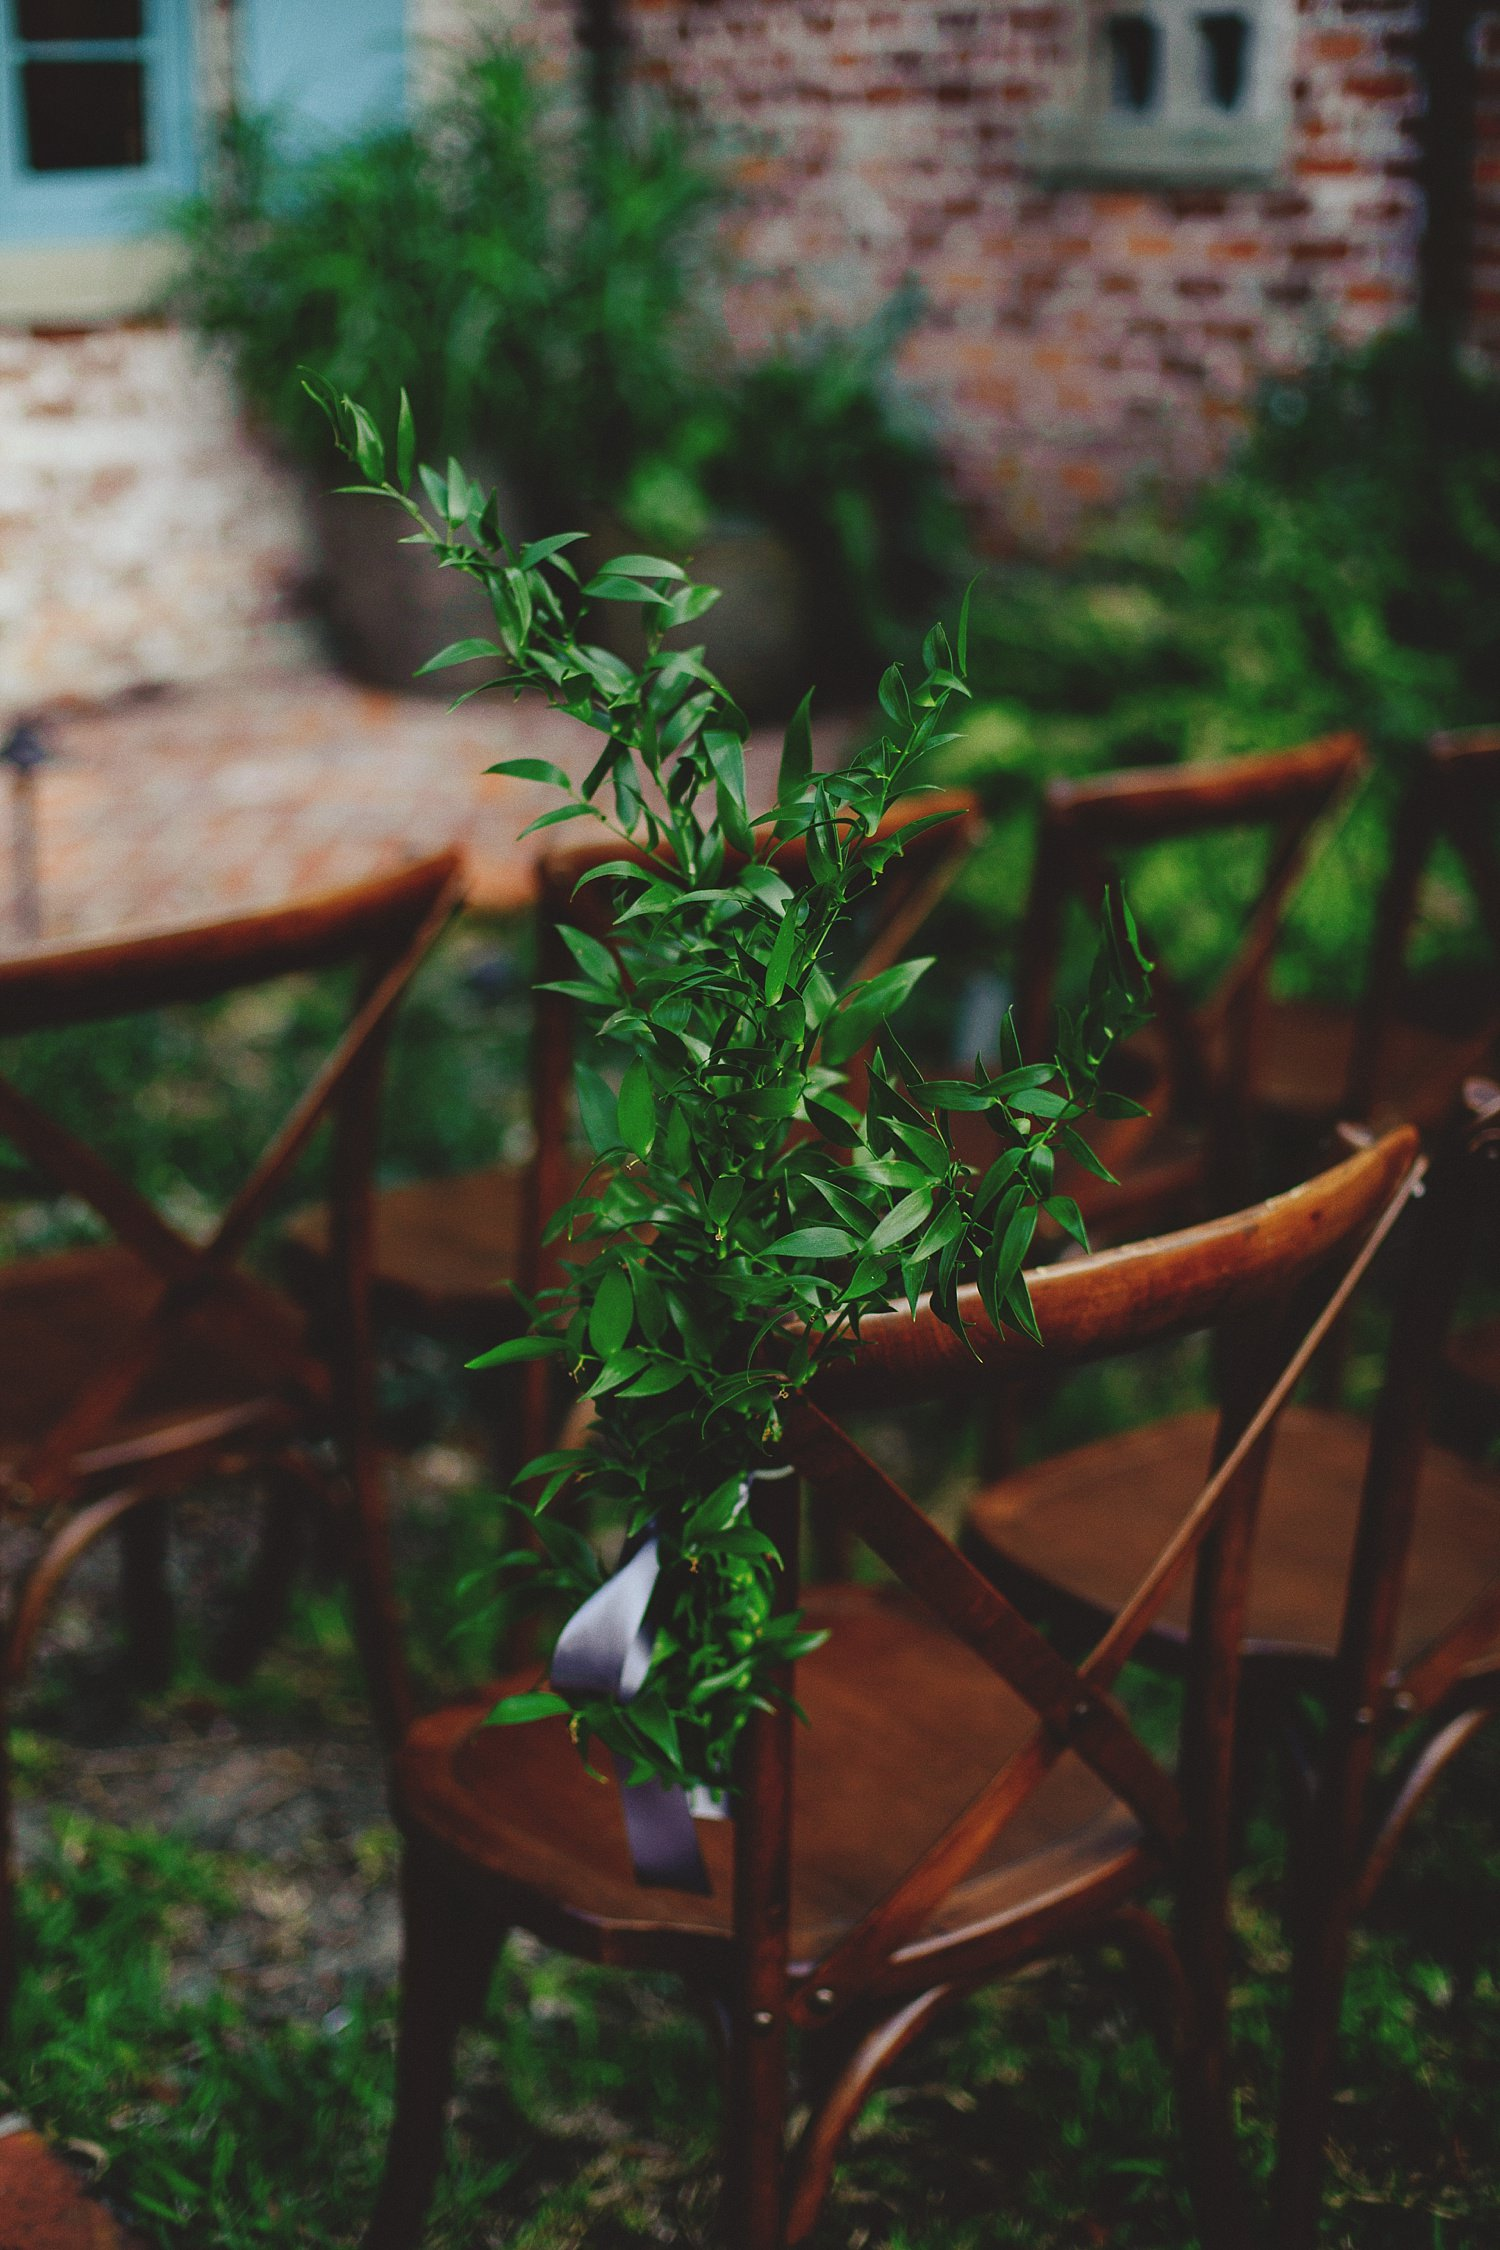 casa feliz wedding photos: greenery on chairs